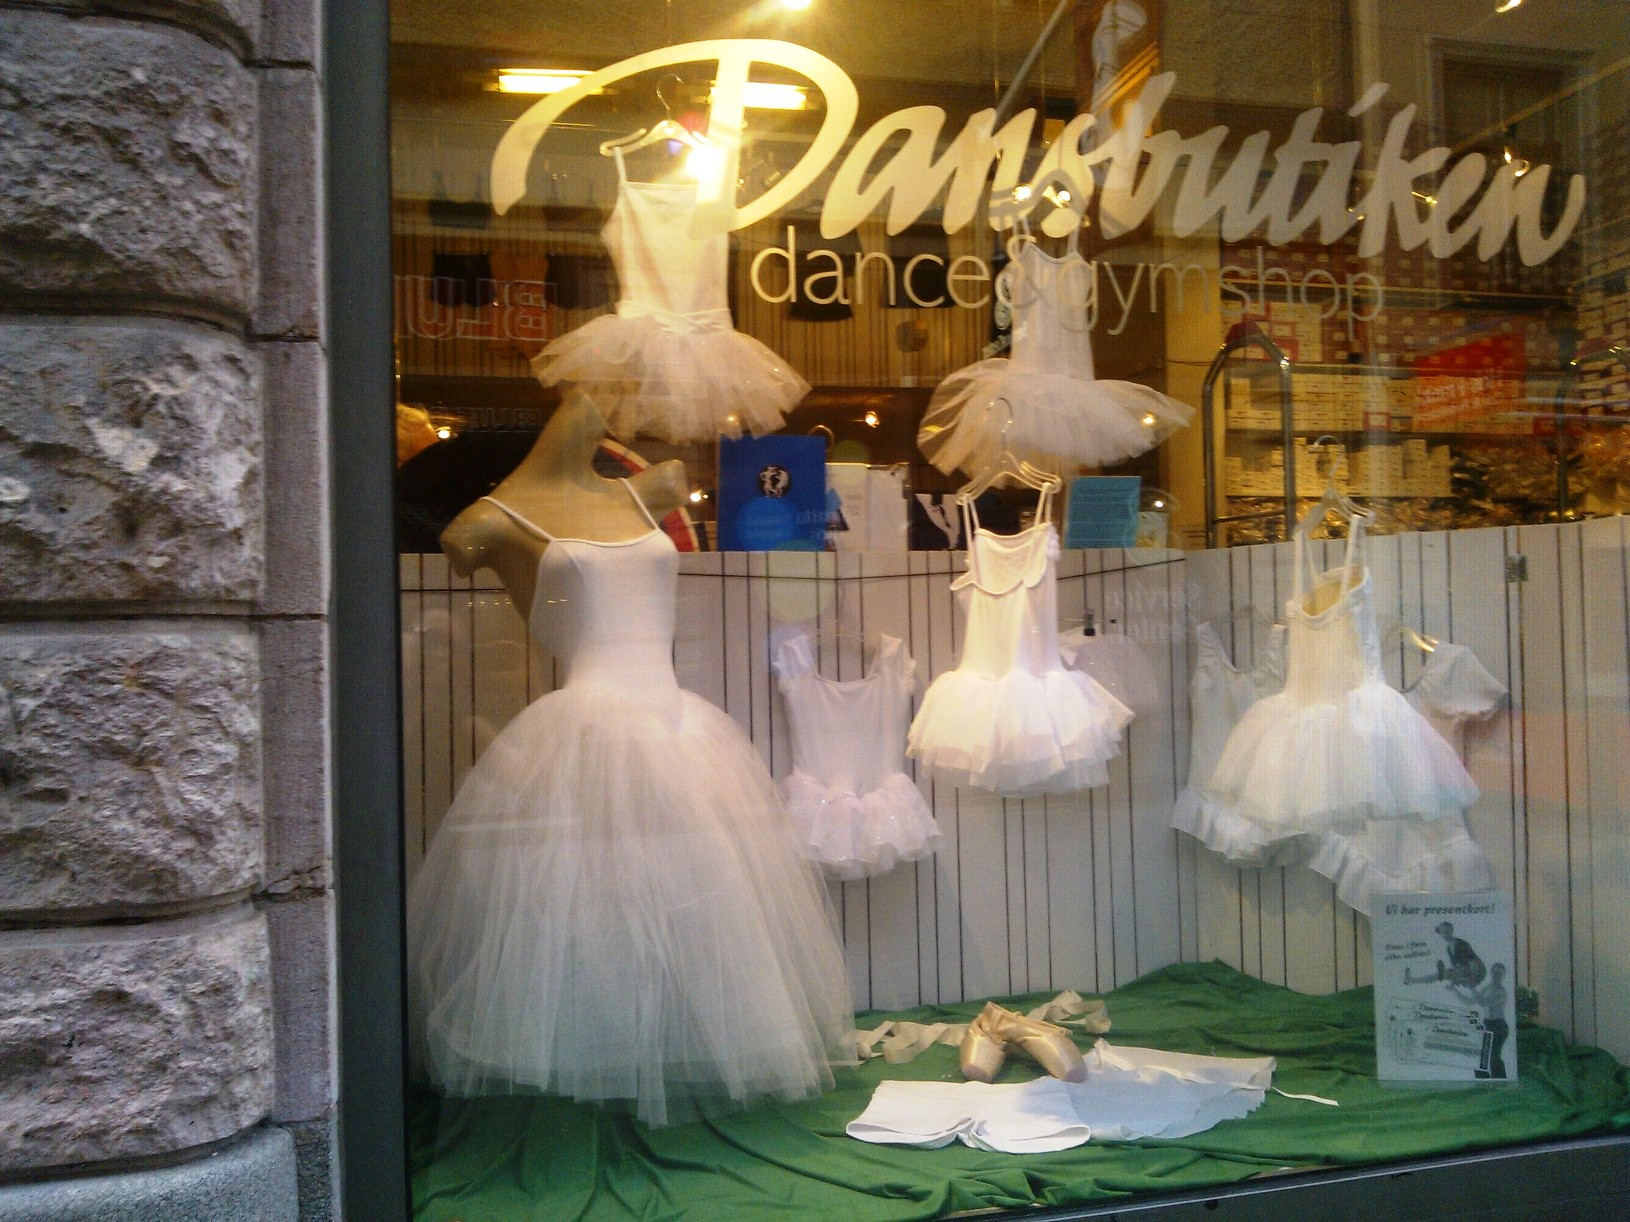 Dansbutiken dance & gymshop